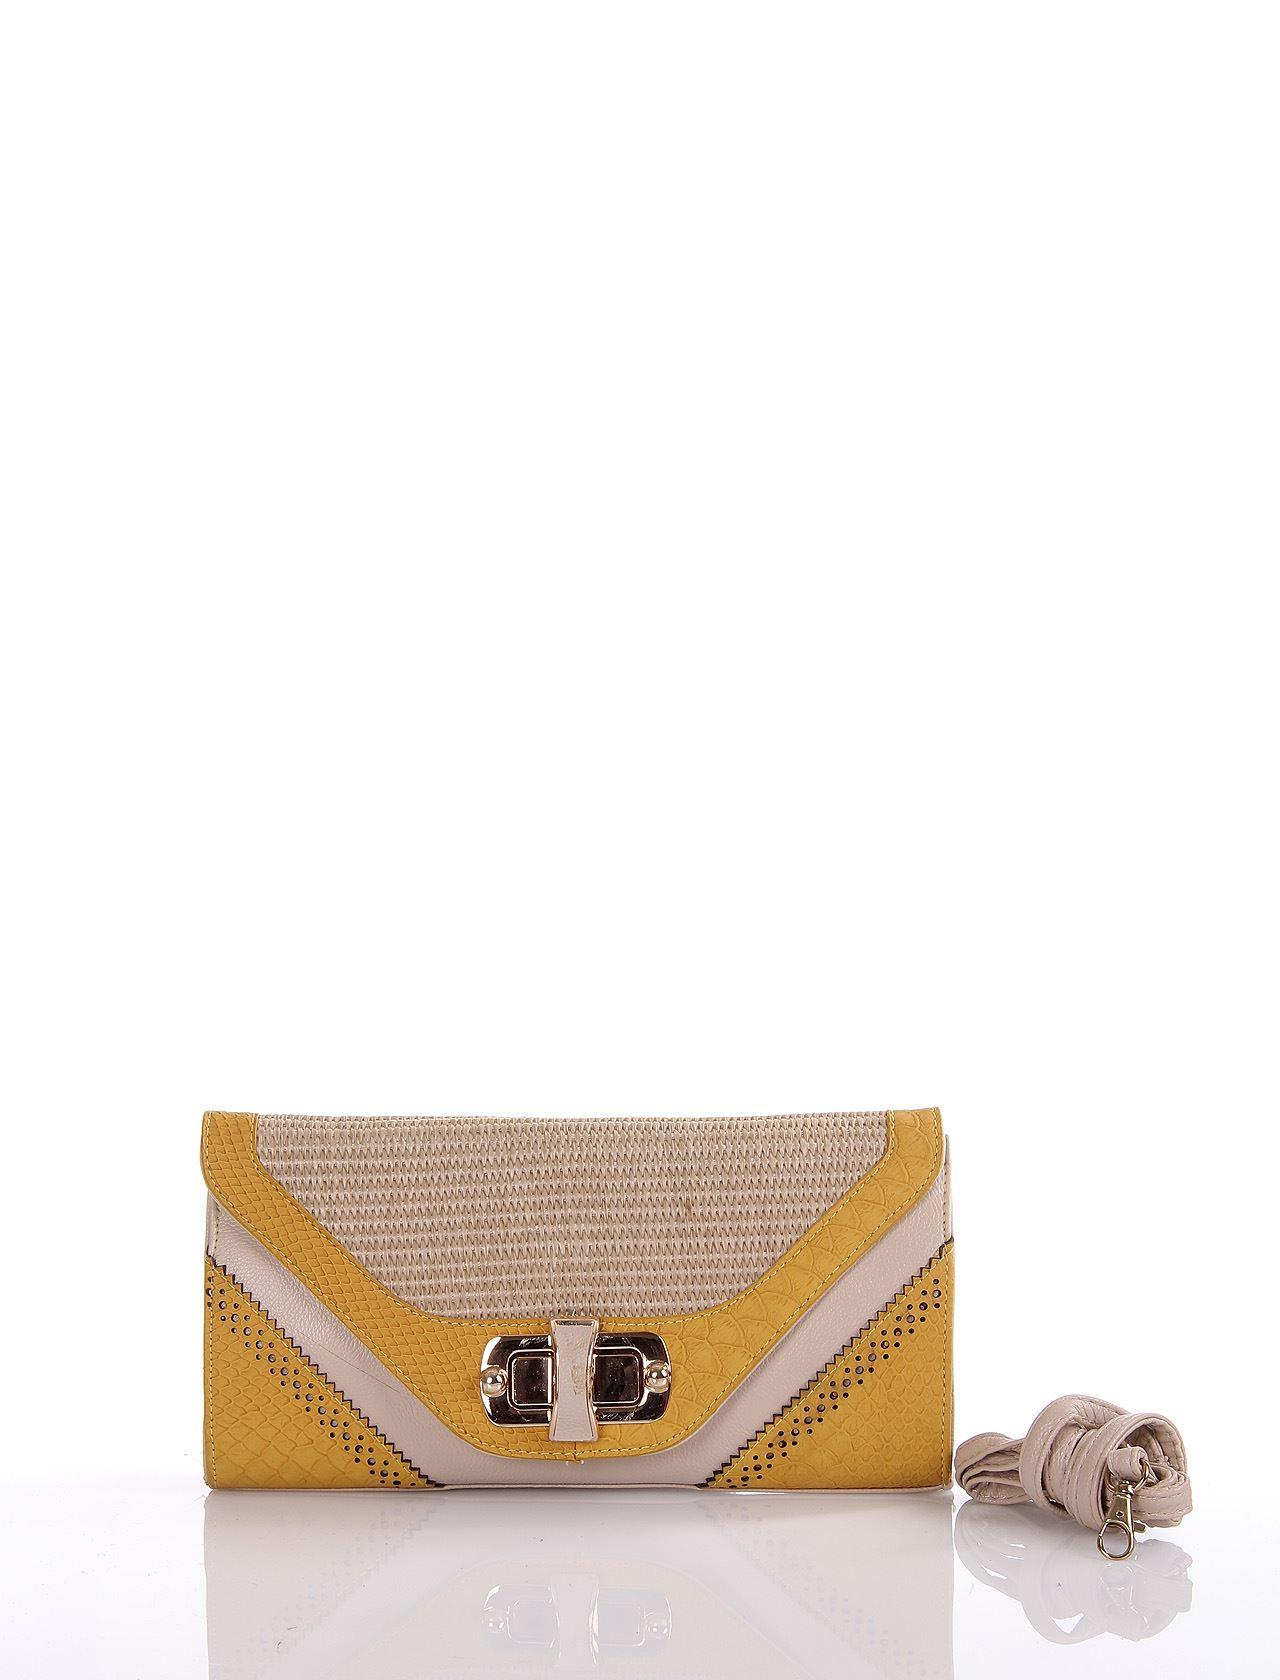 8f8a9c8e3ee76 Portföy Çantalar :: Üçgen Hasır Detay Kapak Kilitli Sarı Pörtföy